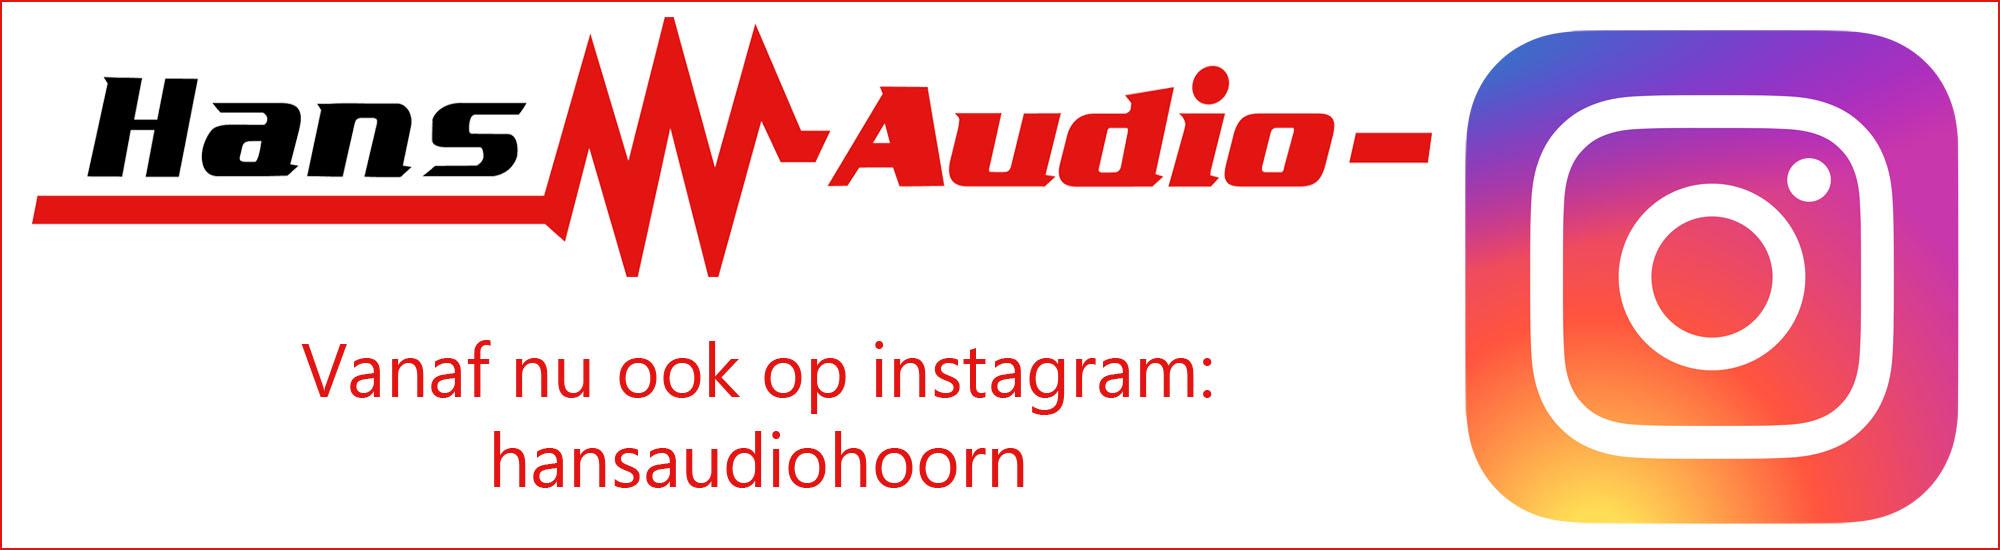 Instagram Hans Audio vanaf nu ook op Instagram